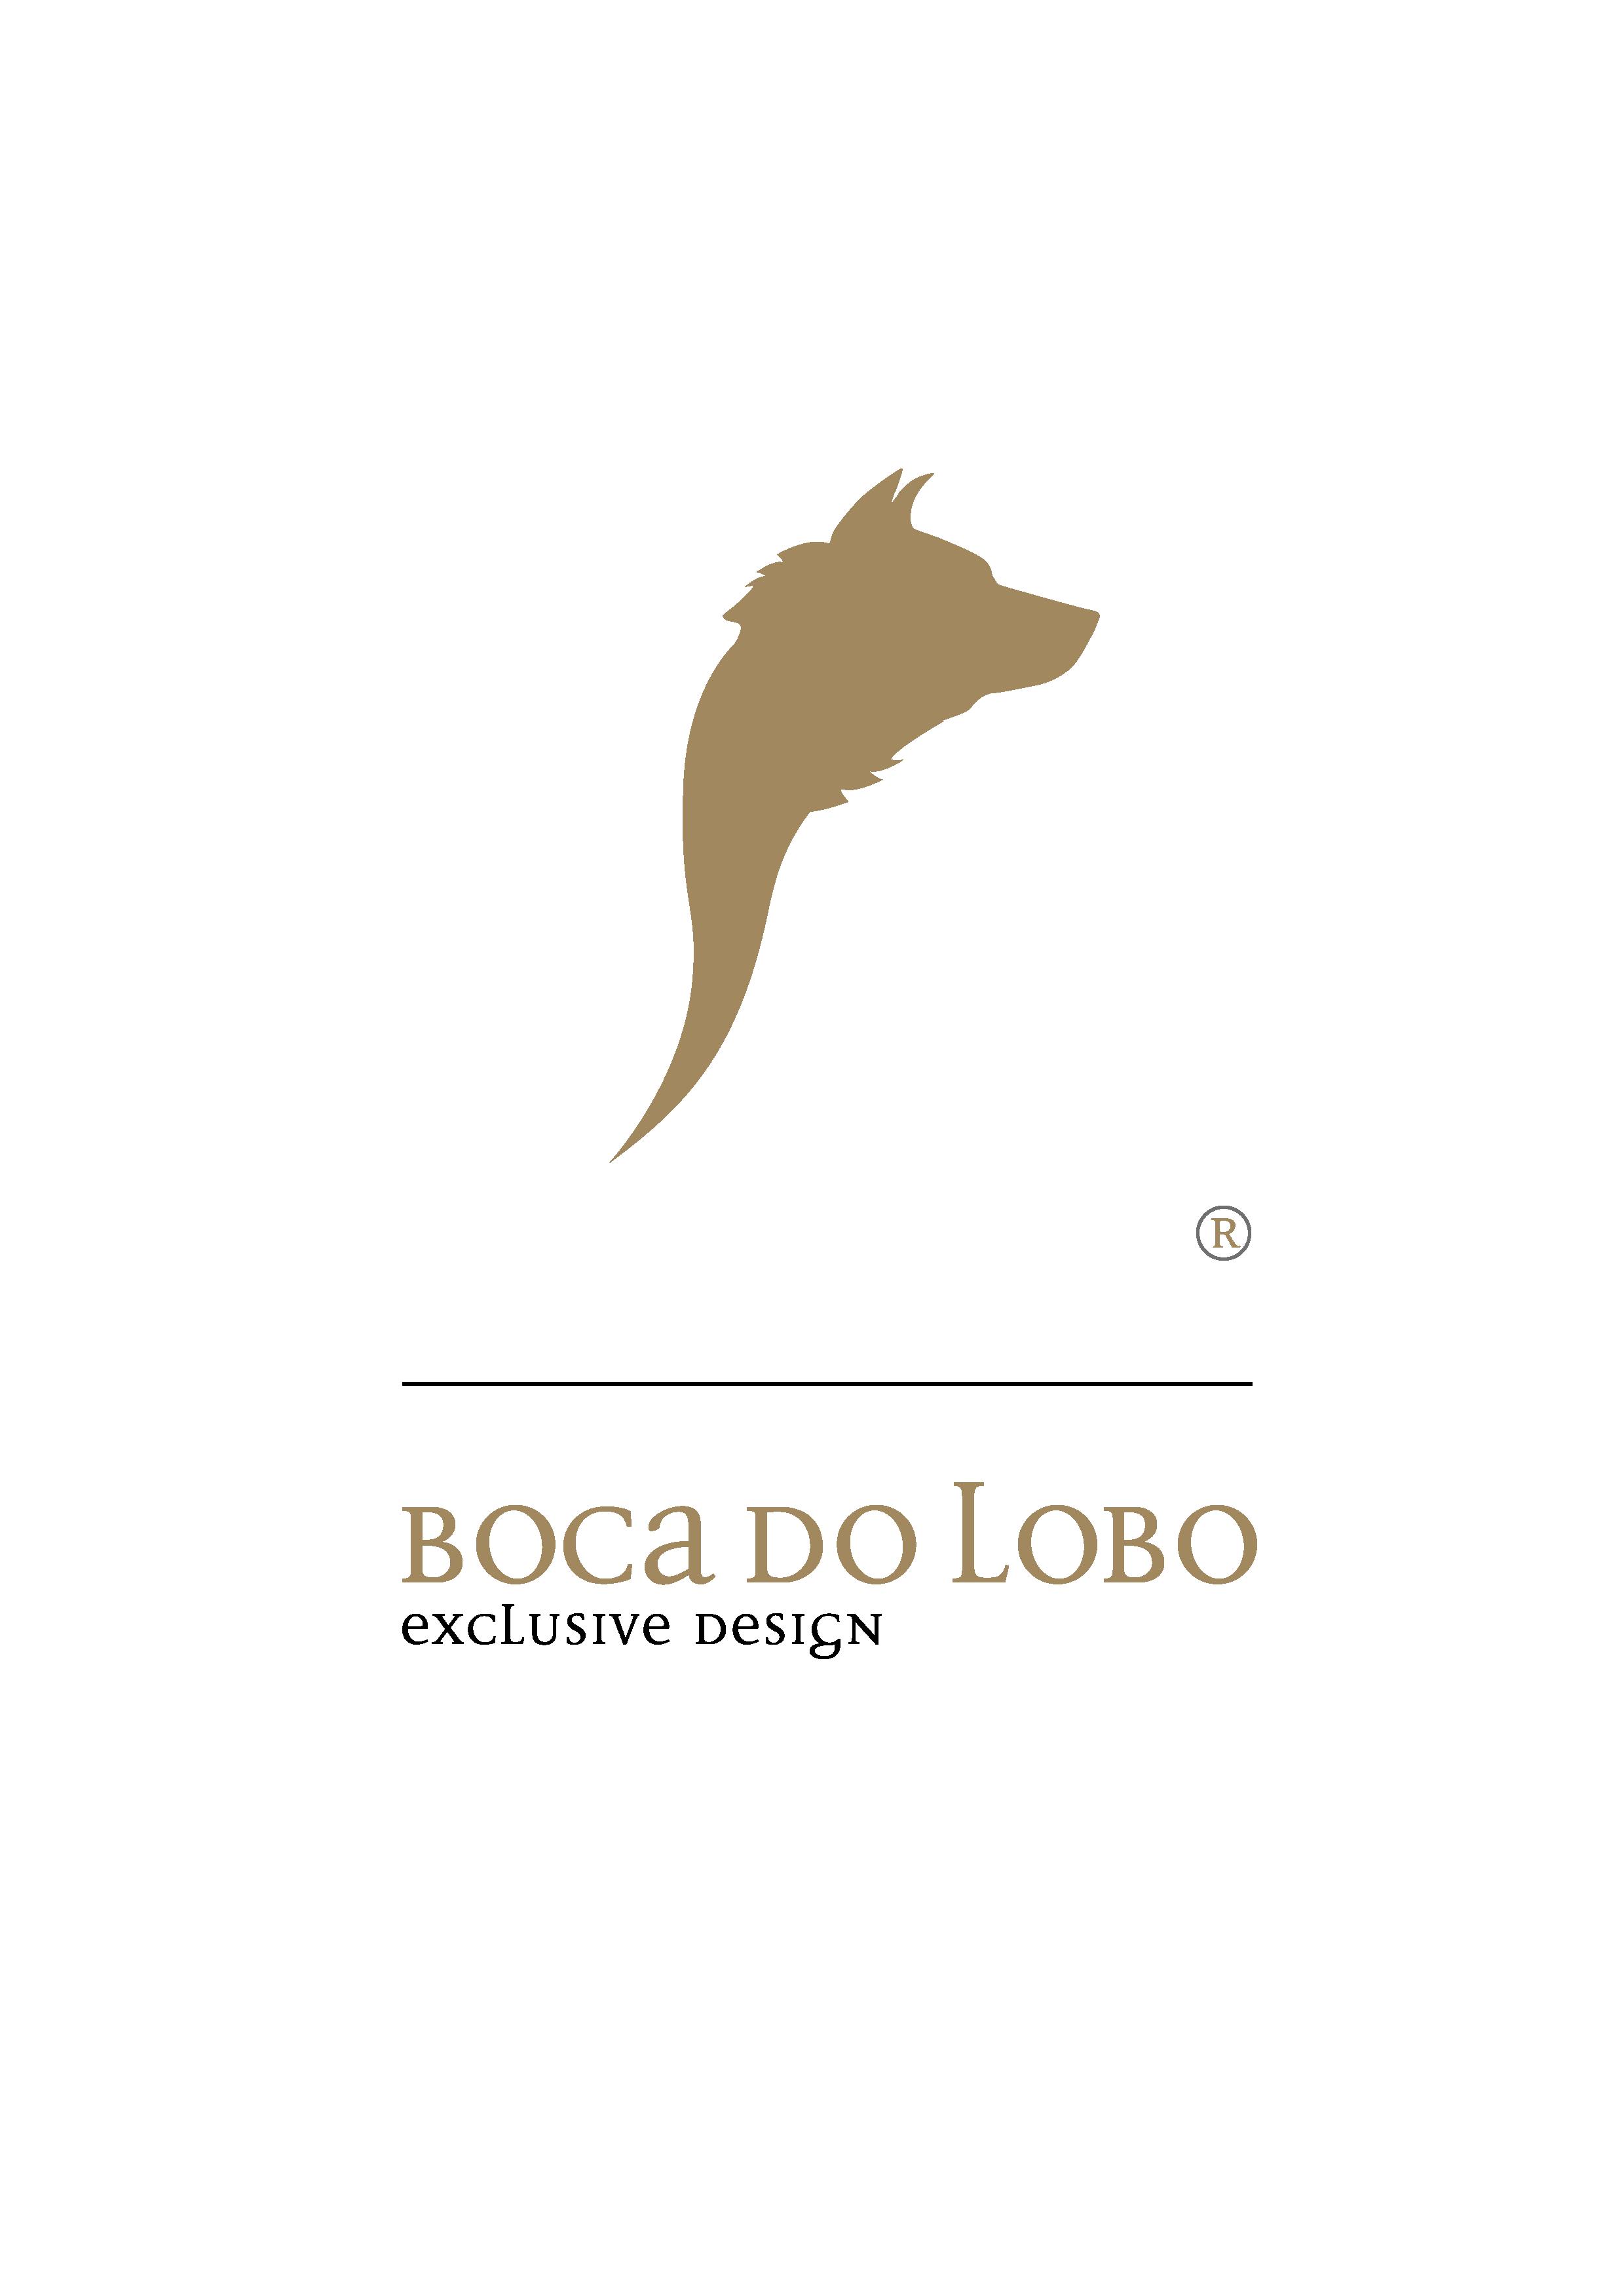 Boca Do Lobo S Inspirational World: Brands